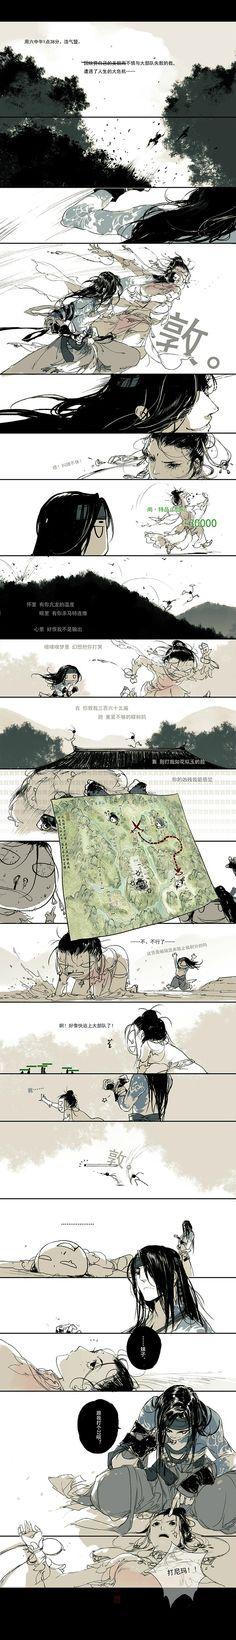 Cai Bang That Tu